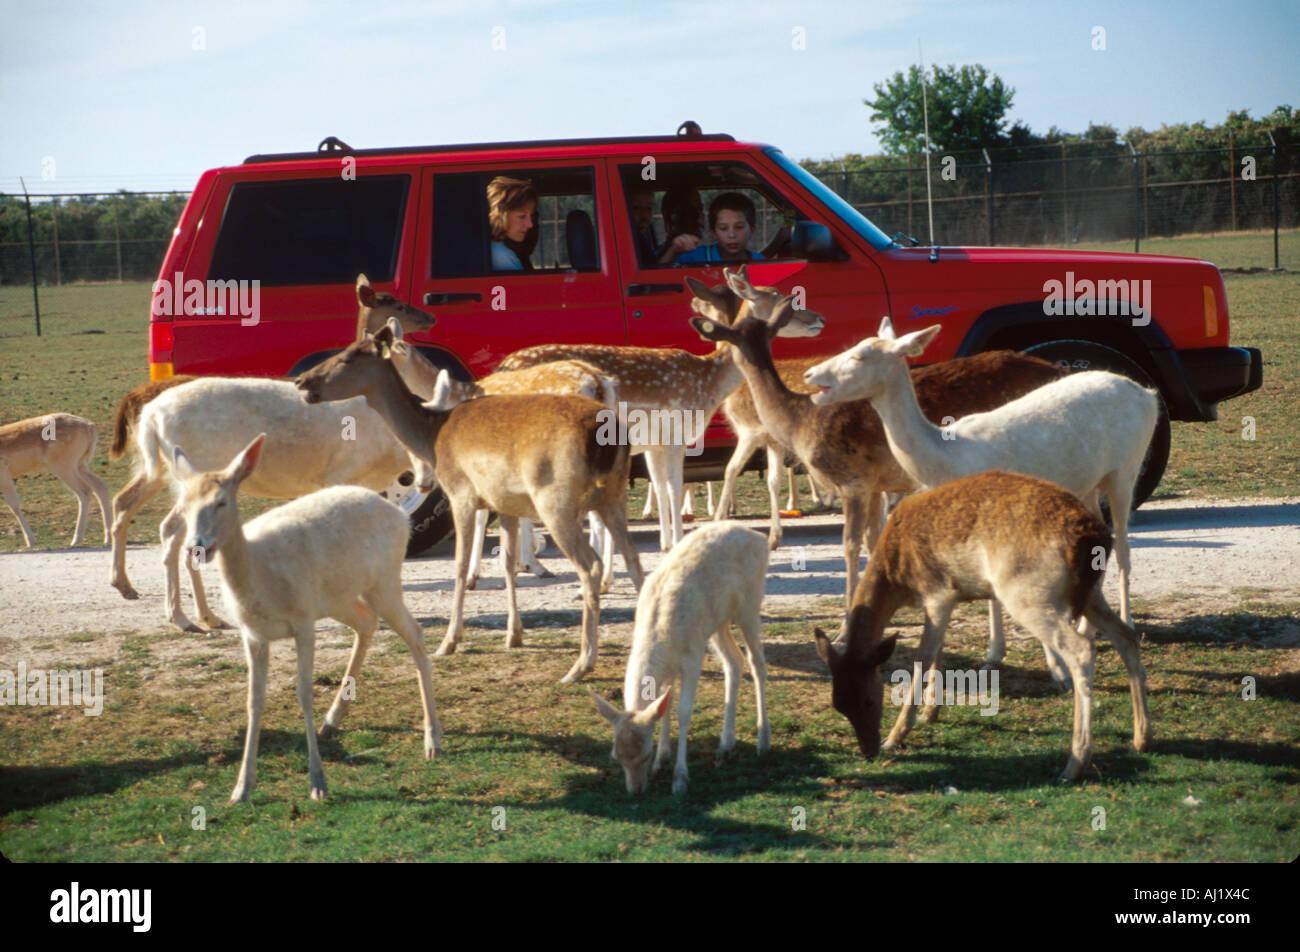 Safari In Ohio >> Ohio Ottawa County African Safari Wildlife Park Visitors Feed Exotic